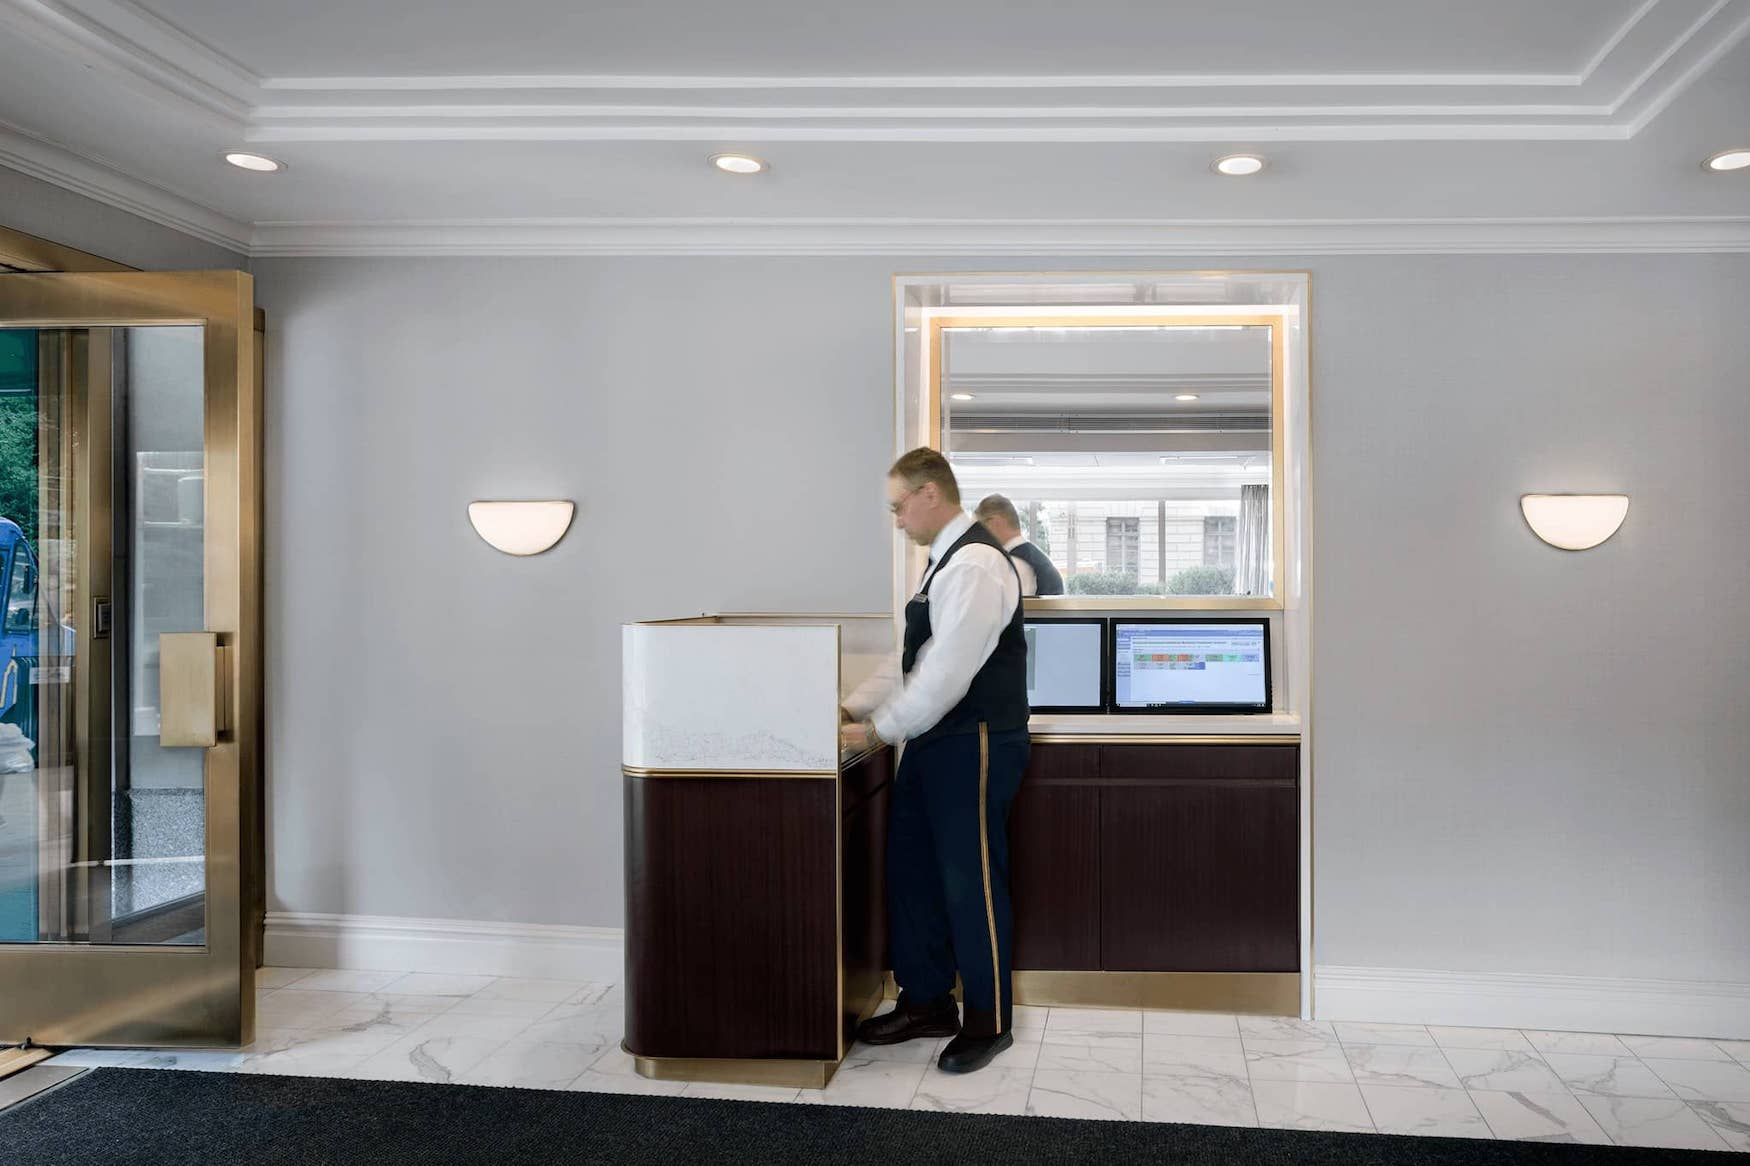 Concierge desk at 1050 Fifth Avenue